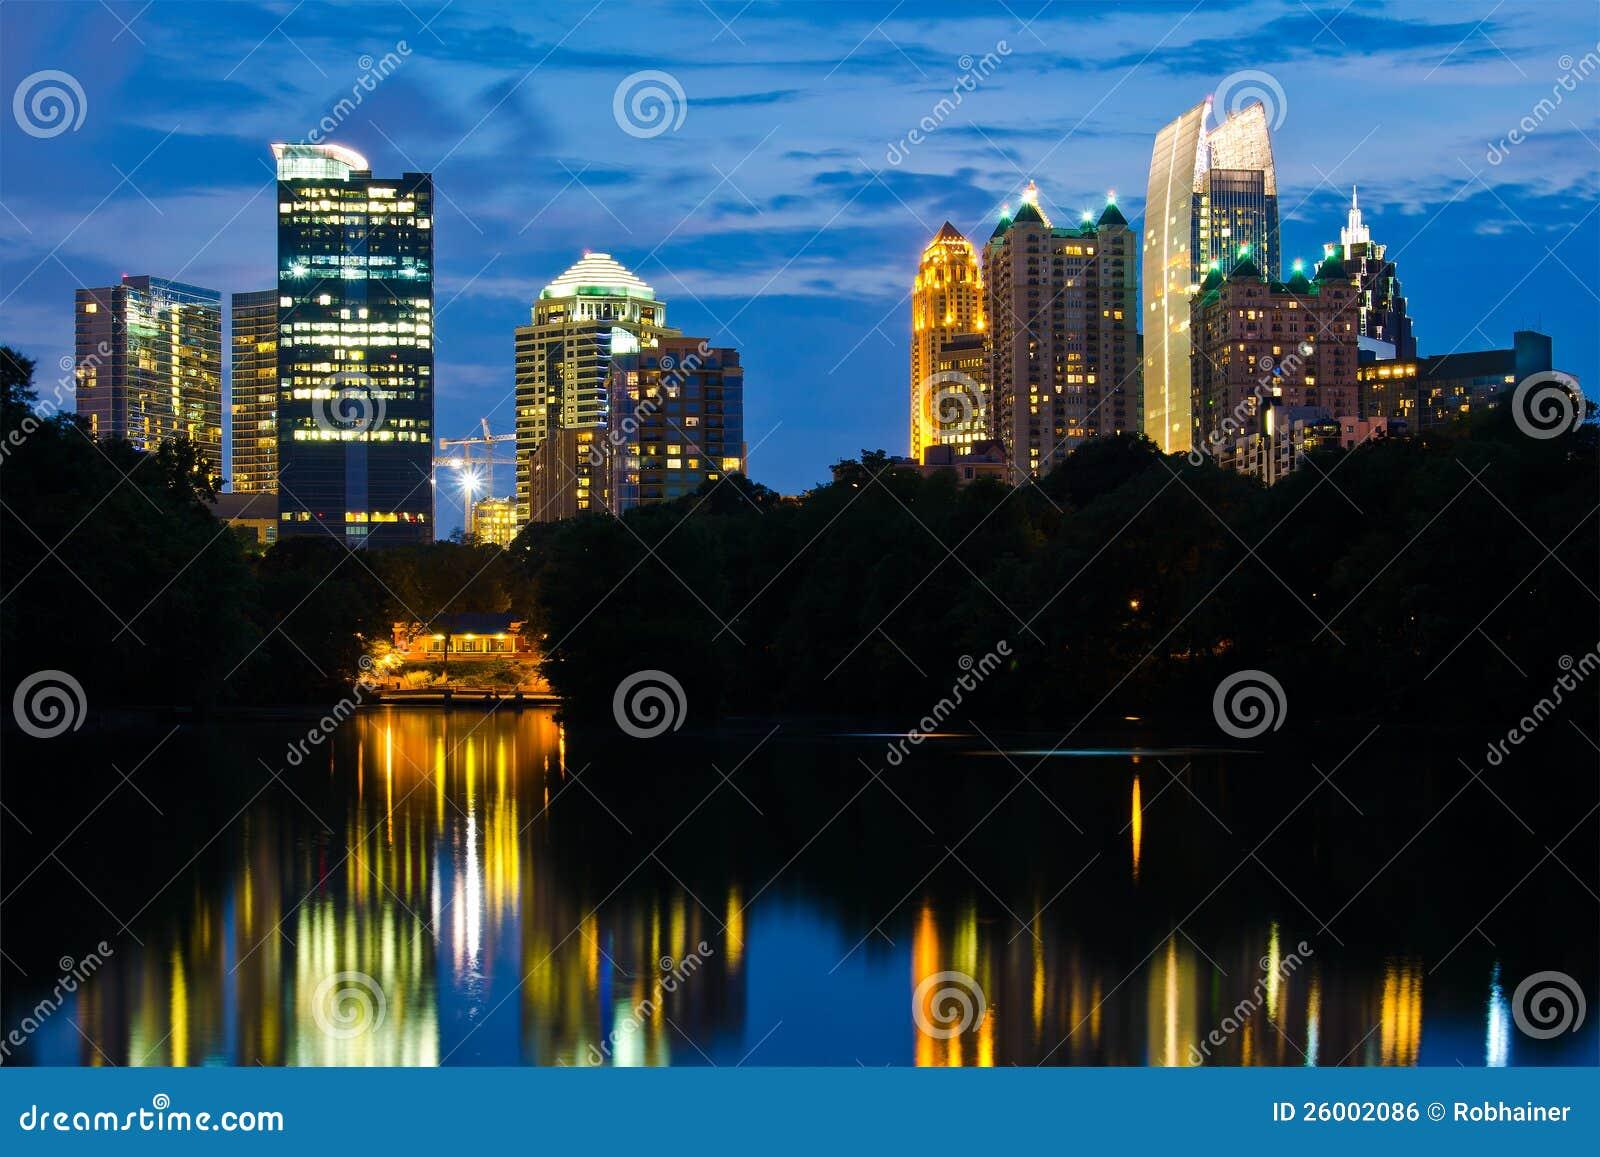 Download Atlanta midtown skyline stock photo. Image of nature - 26002086